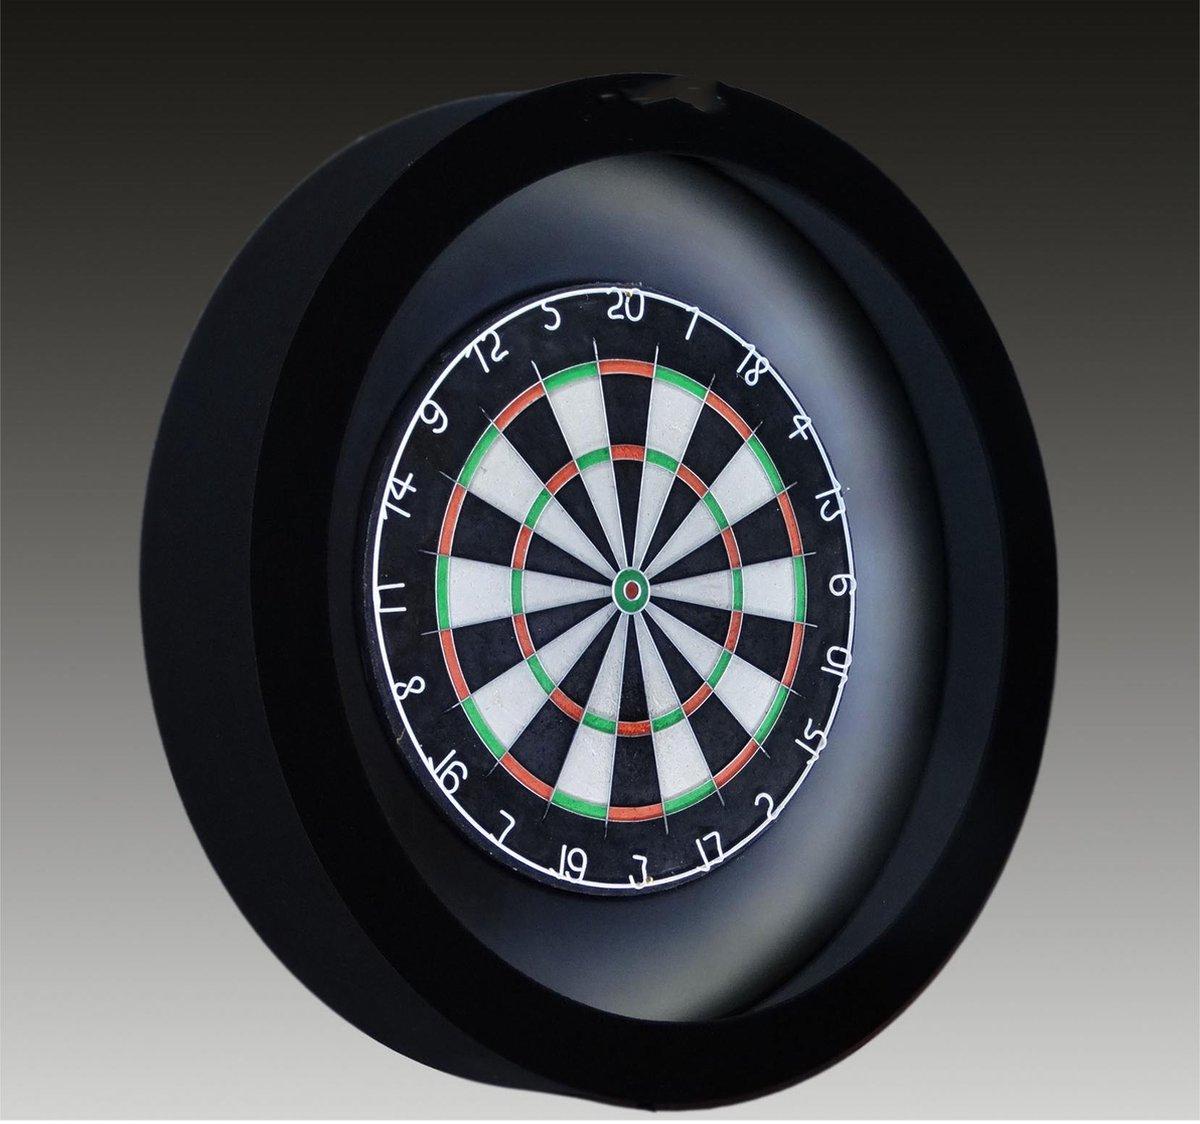 TCB XXL - Dartbord Verlichting Complete Combiset inclusief - dartbord - inclusief - dartboard surround - Zwart